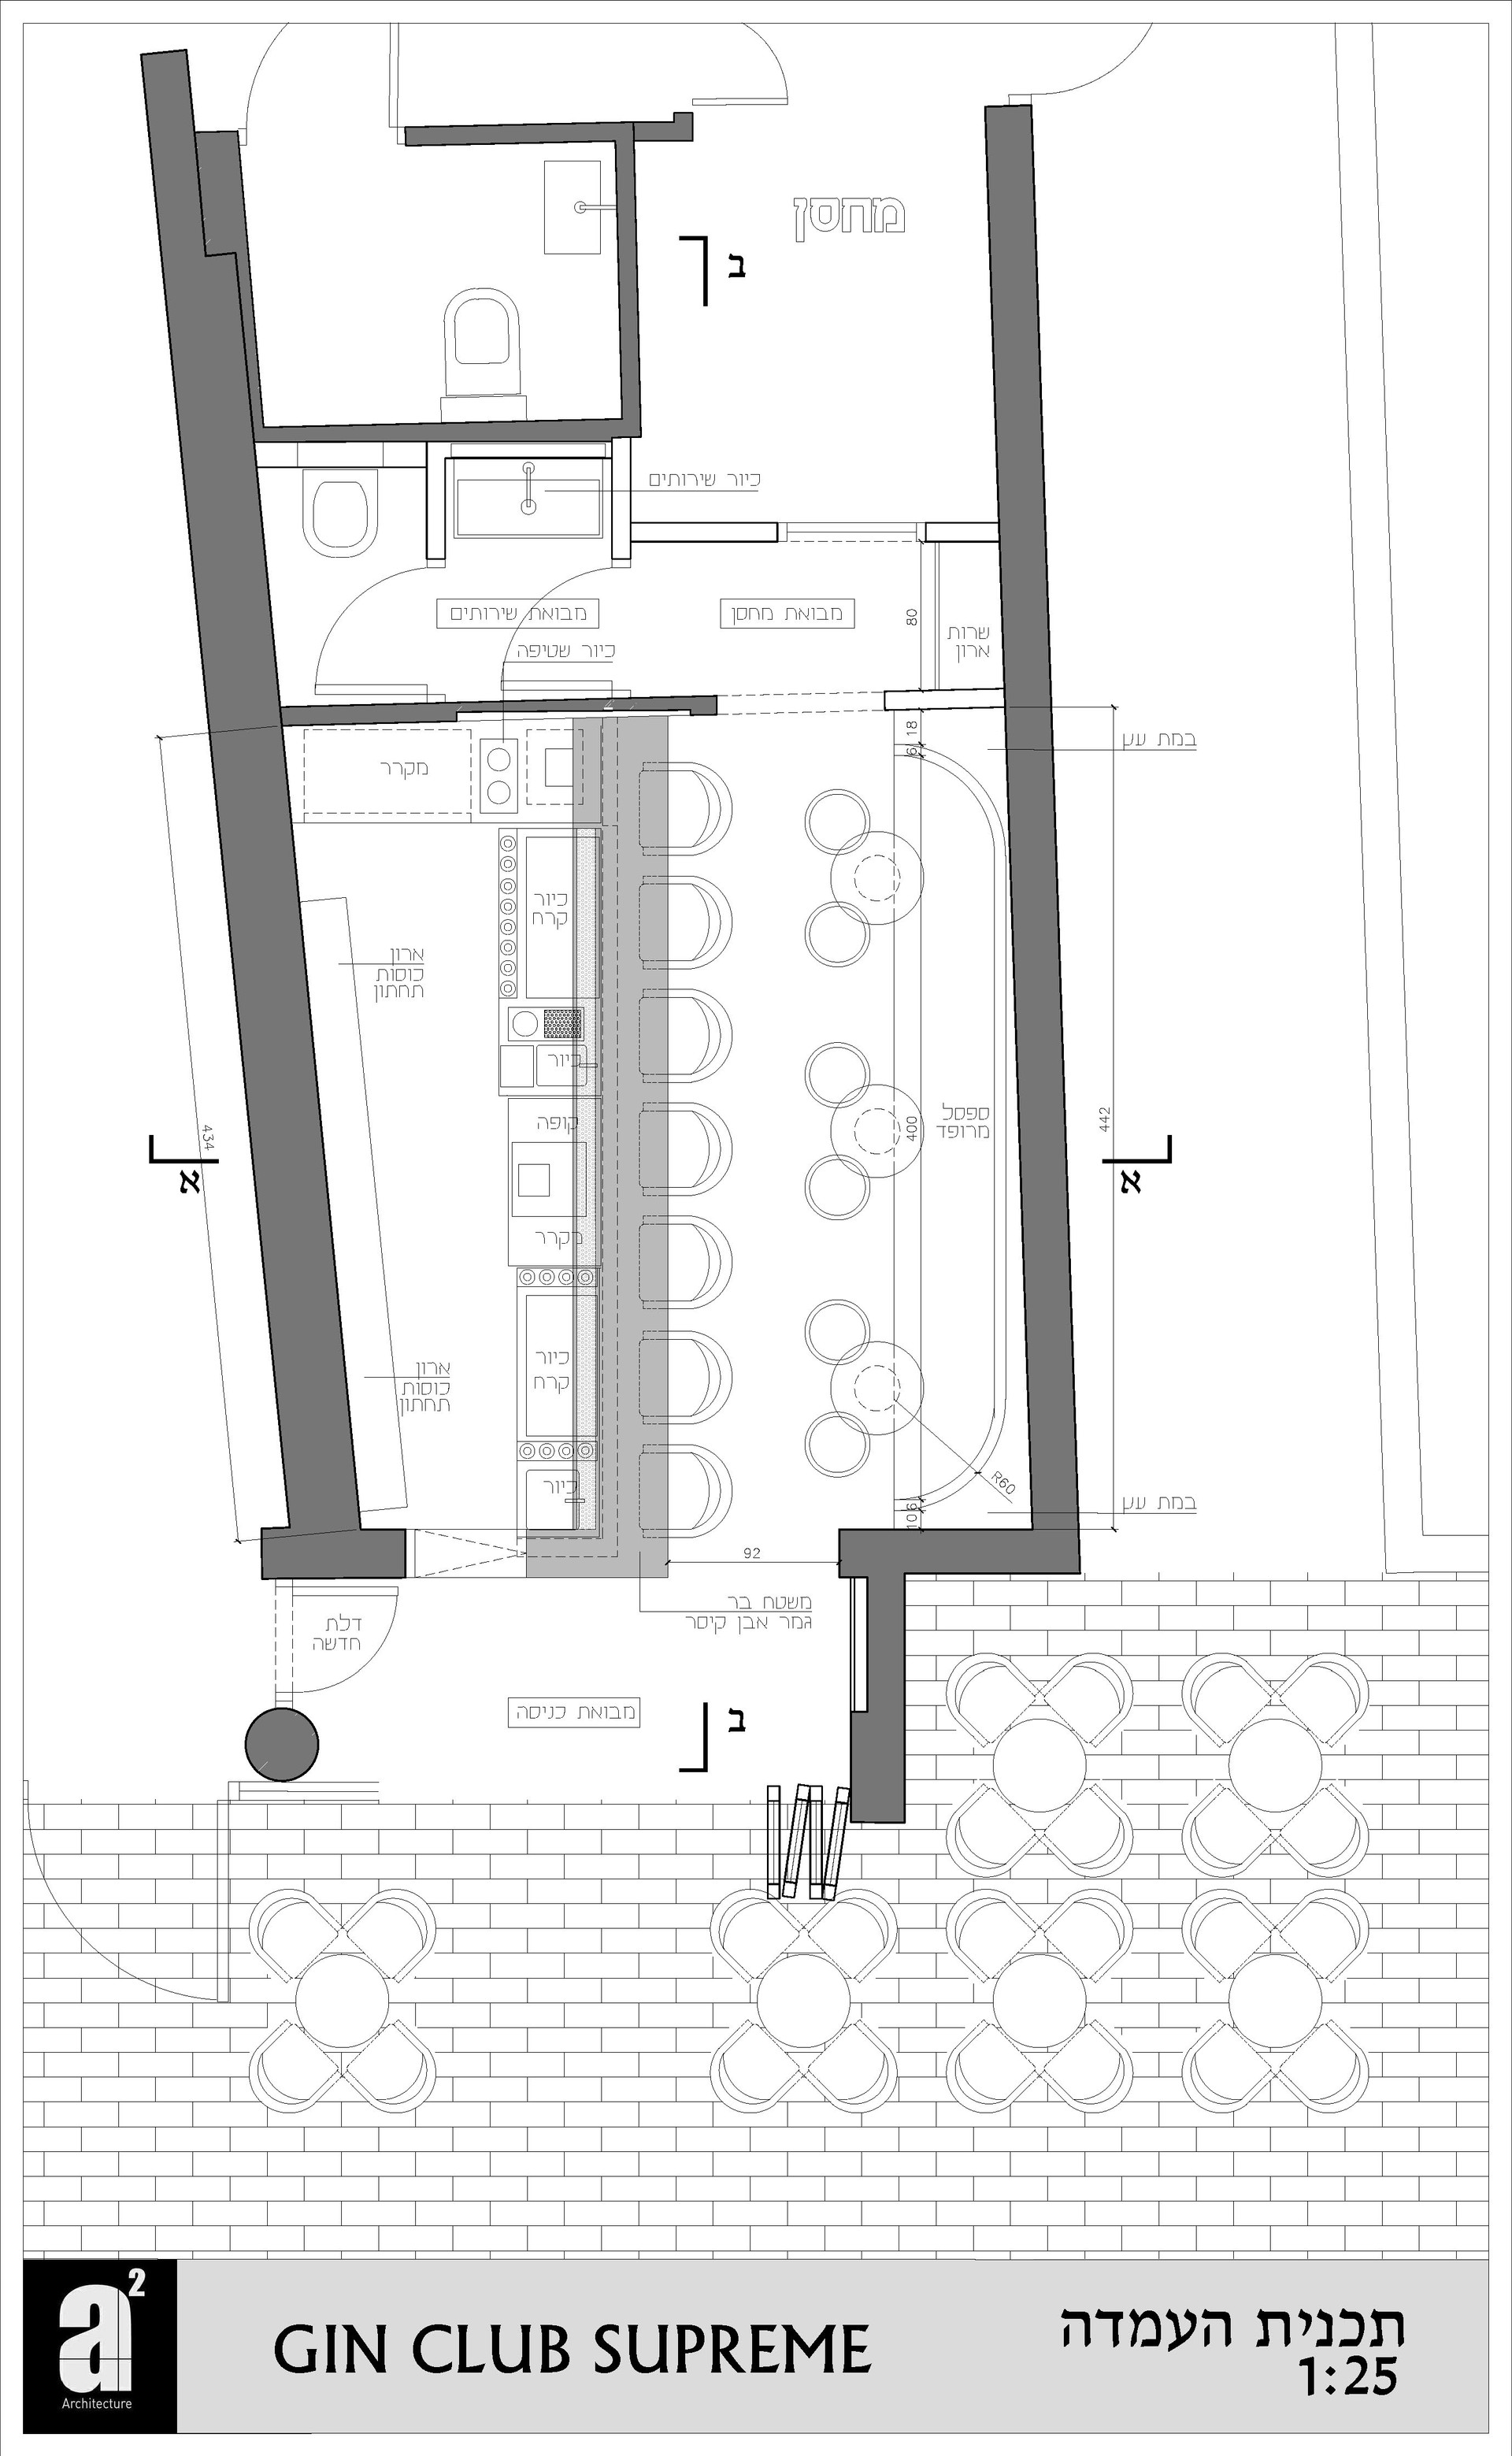 gin club supreme-layout plan.jpg